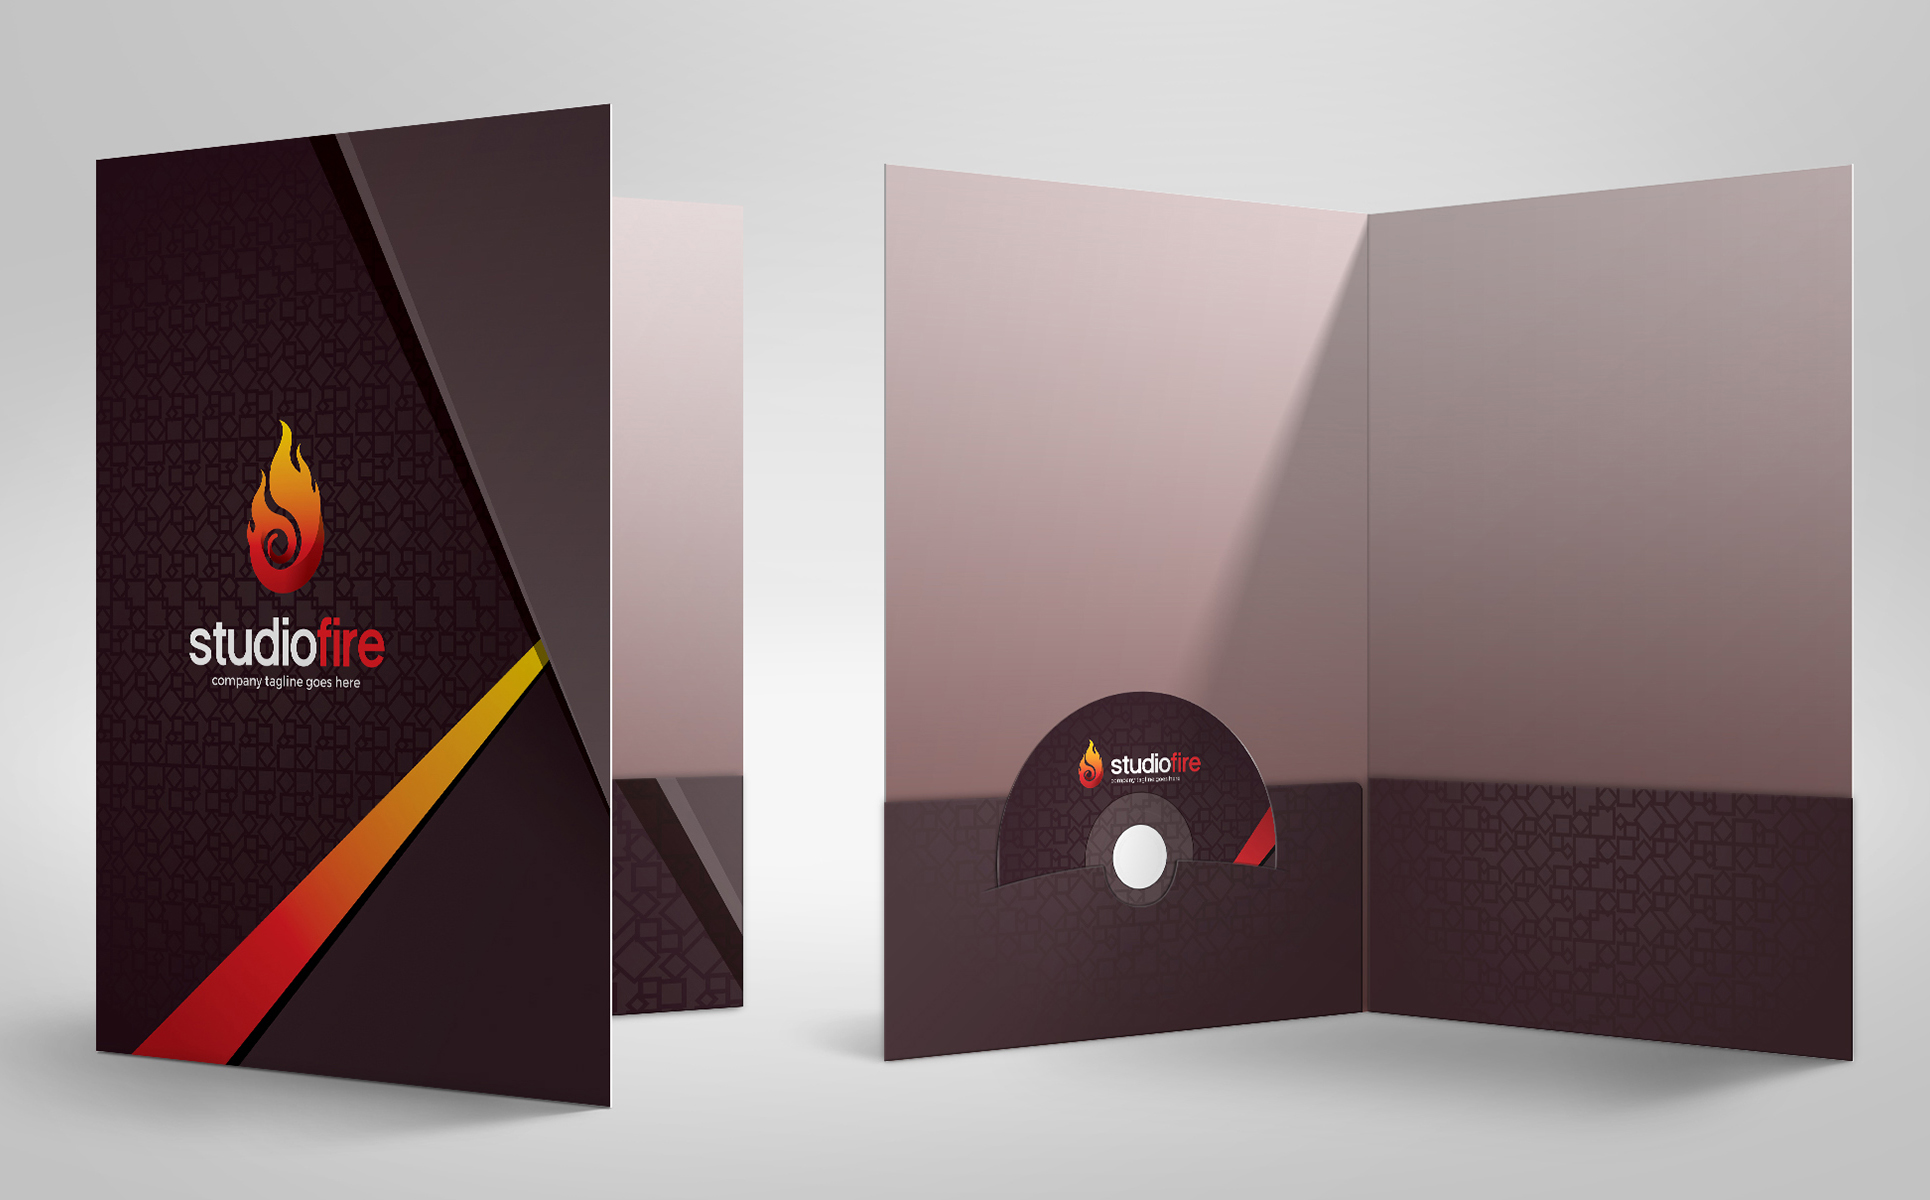 studiofire creative presentation folder with pocket design template